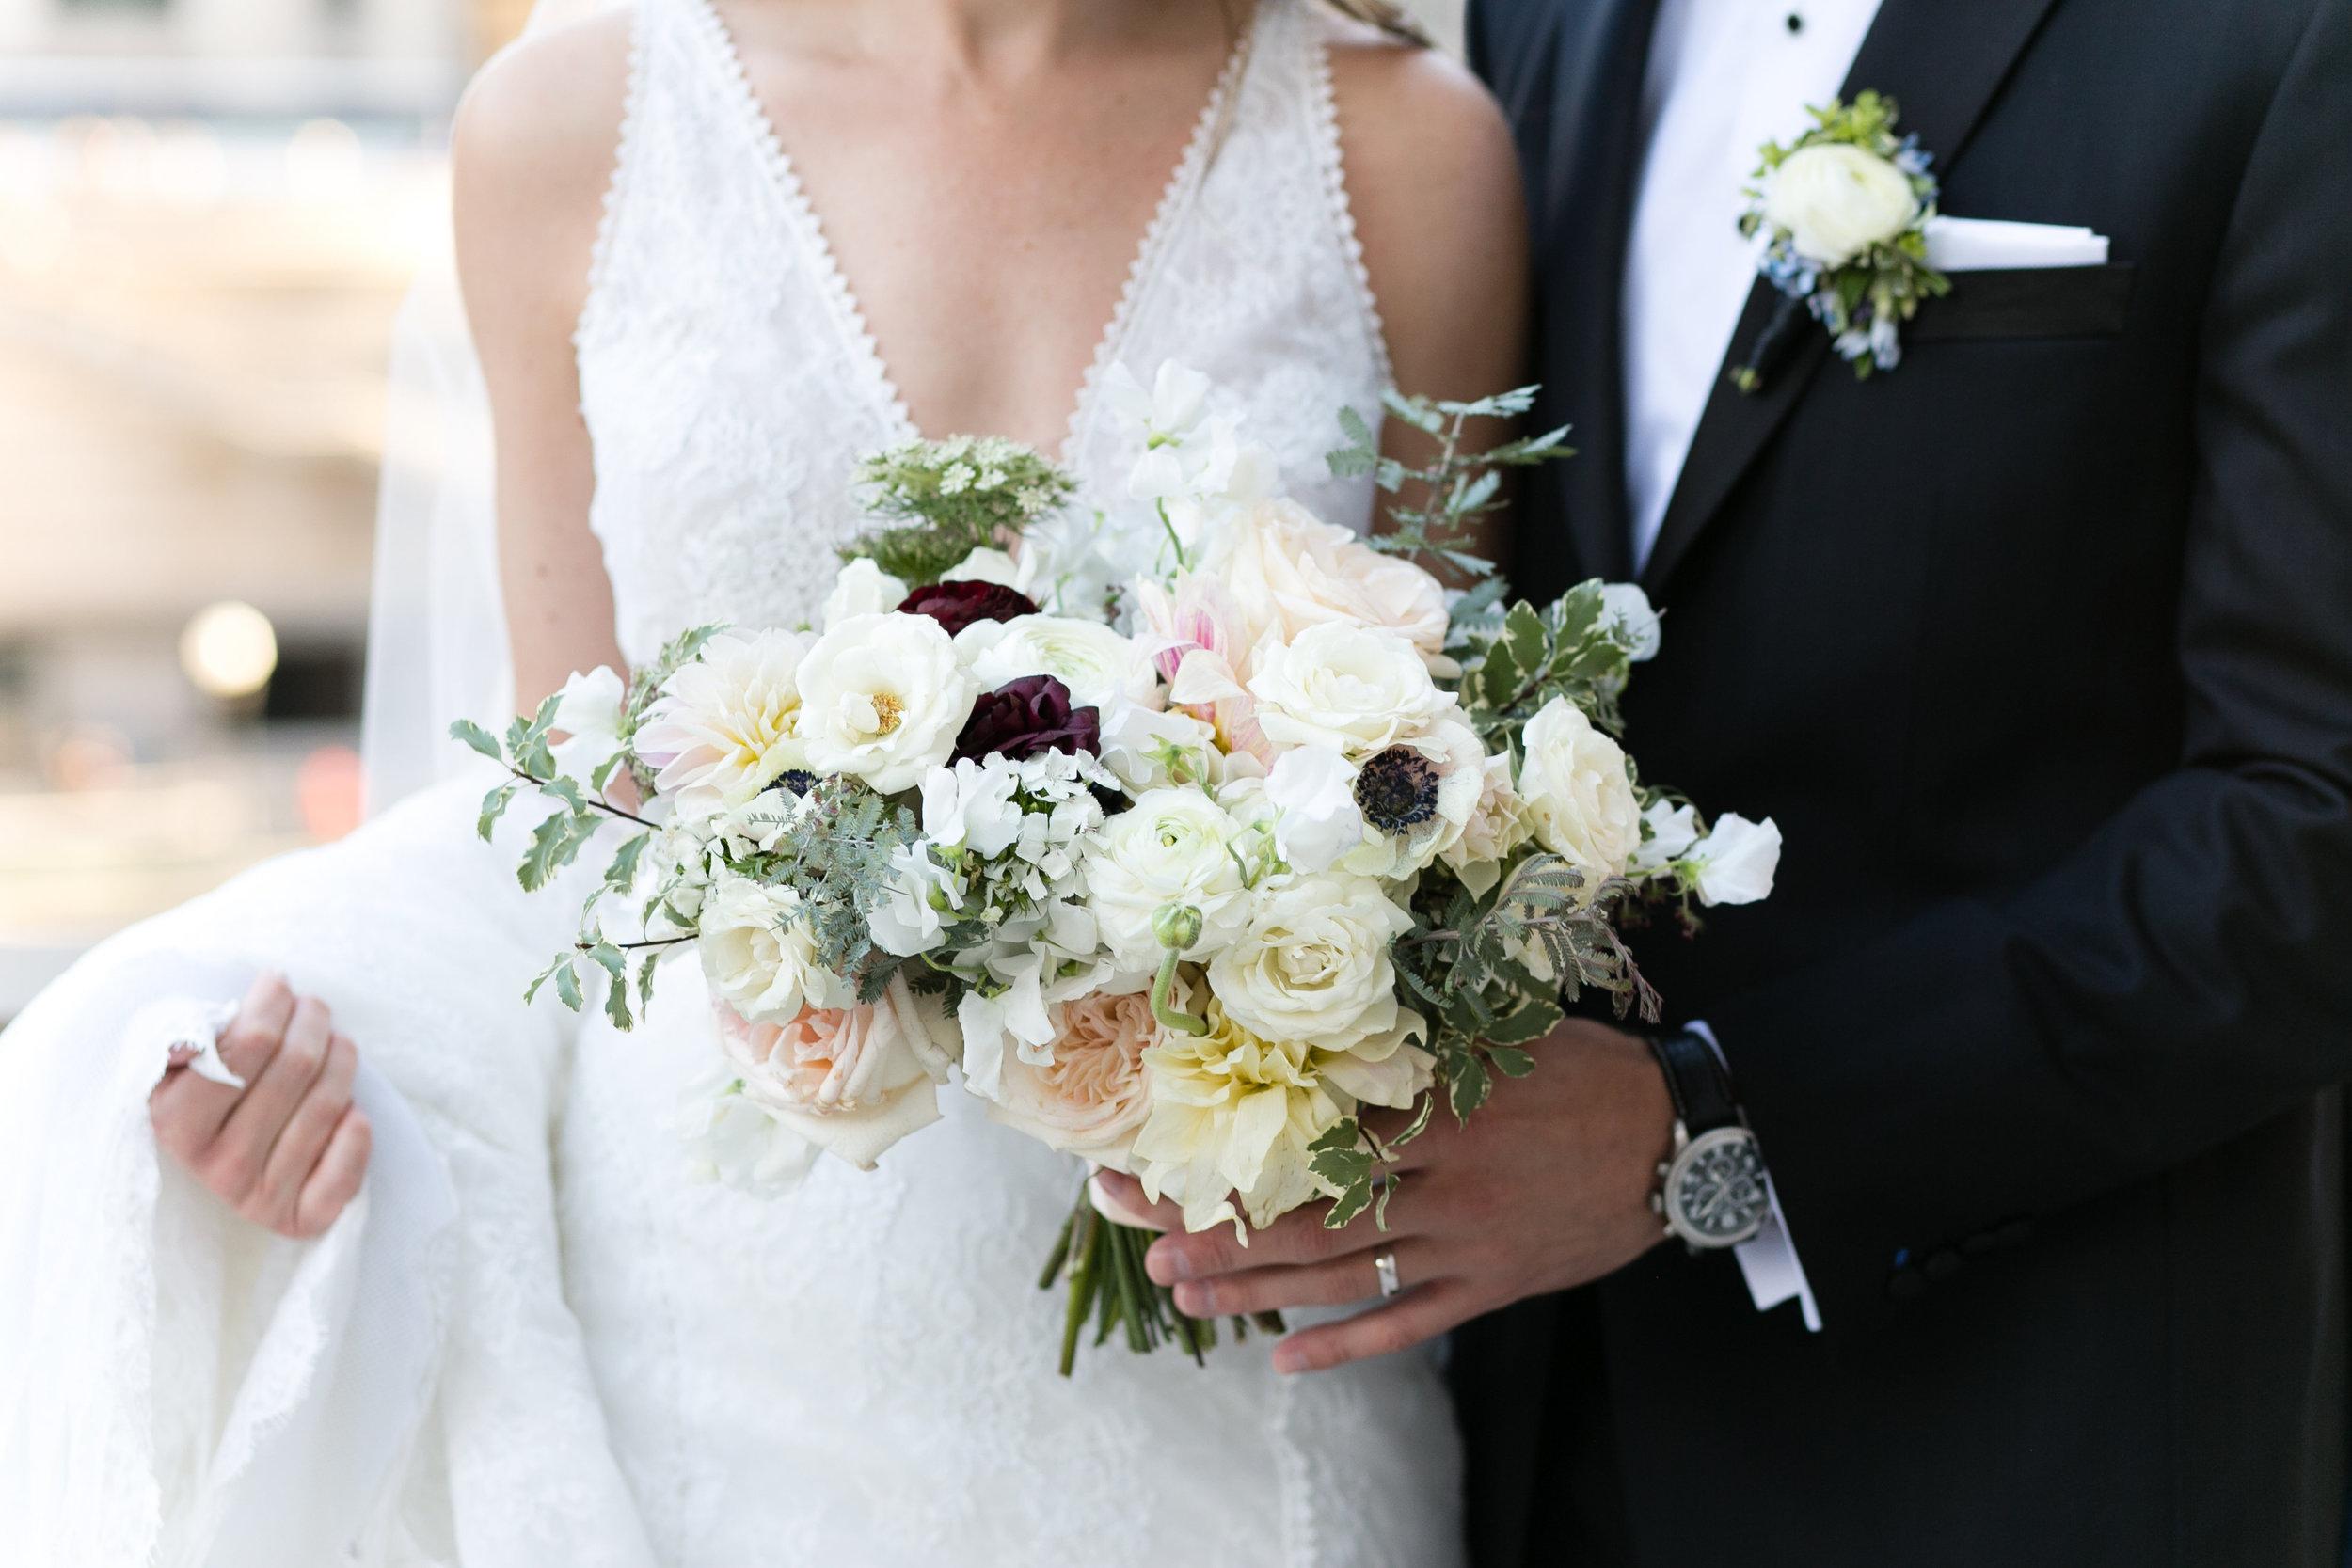 Fleur-Inc-Emilia-Jane-Photography-Estera-Events-Langham-Hotel-Chicago-Wedding-Anemones-Ohara-Garden-Rose-Ranunculus-boutonniere